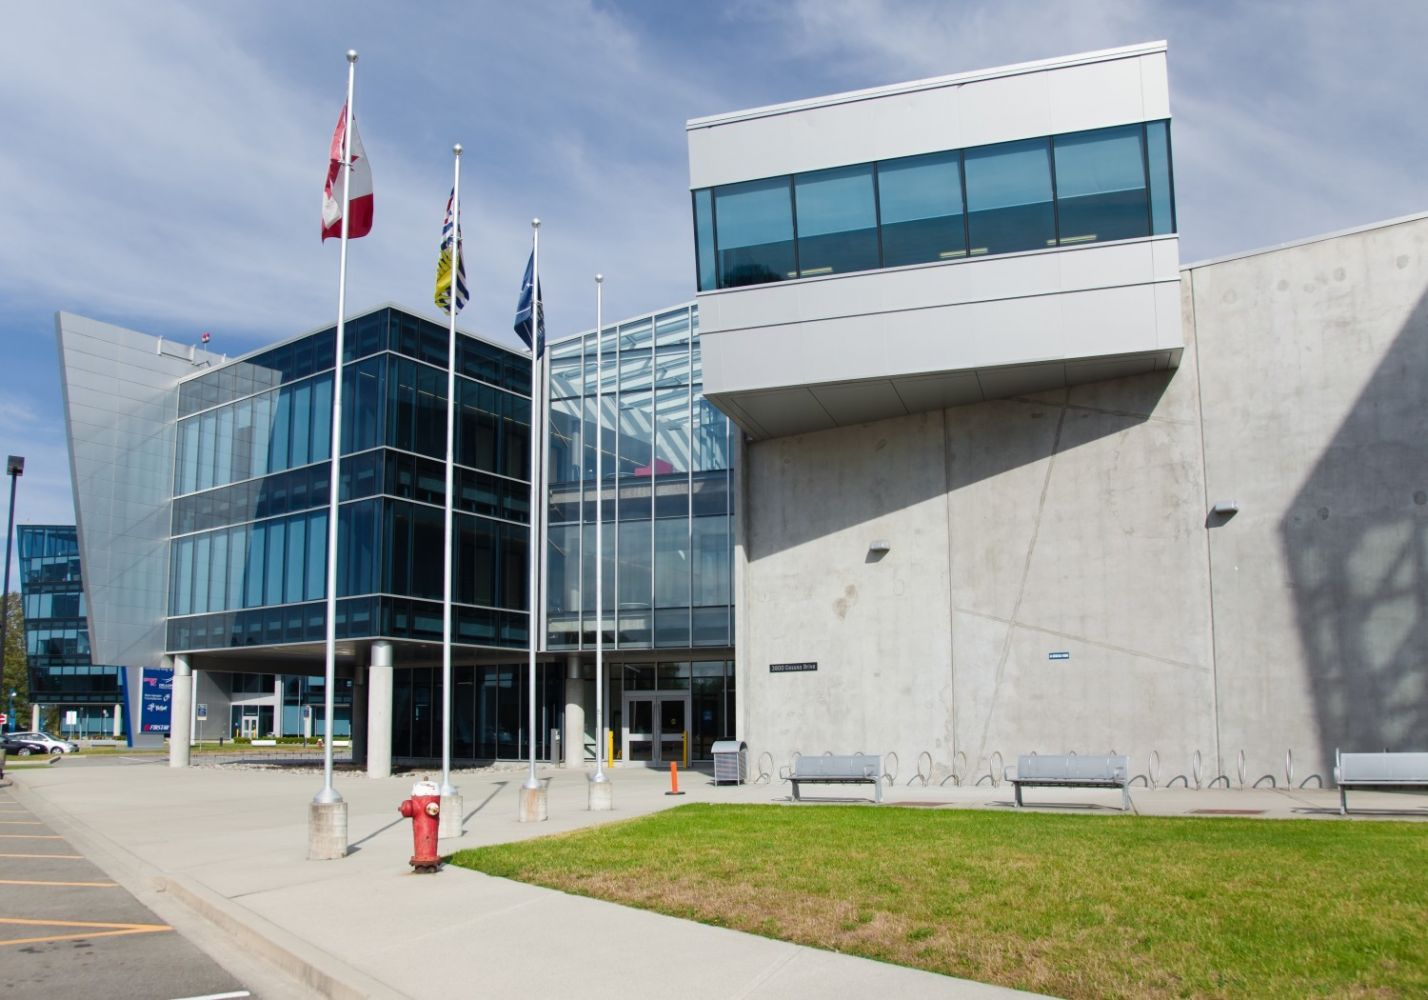 British Columbia Institute of Technology Aerospace Technology Campus Ranking